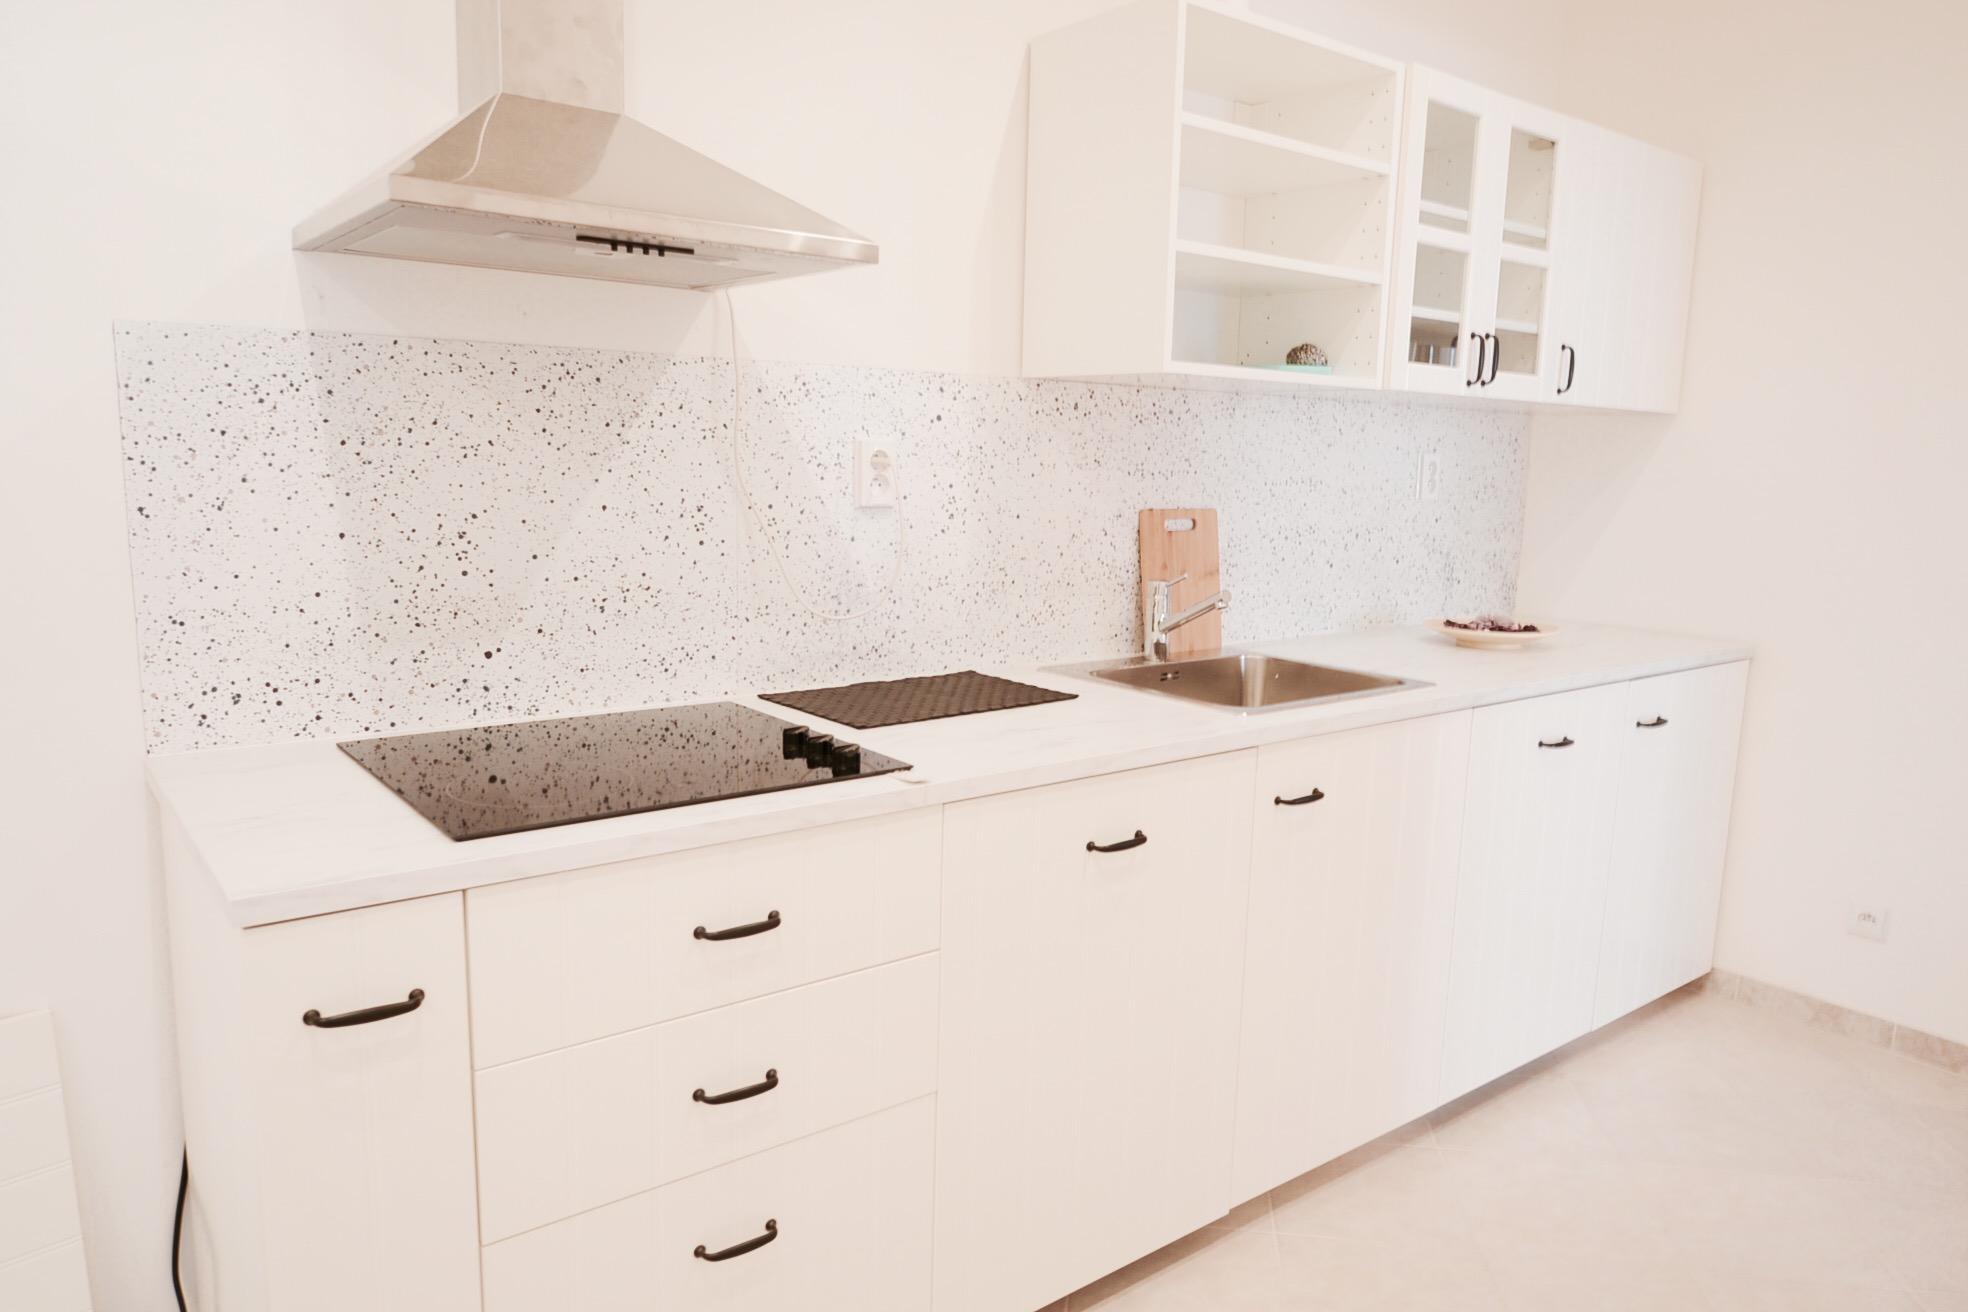 Slavojova, Nusle, byt 2+kk, 82 m²